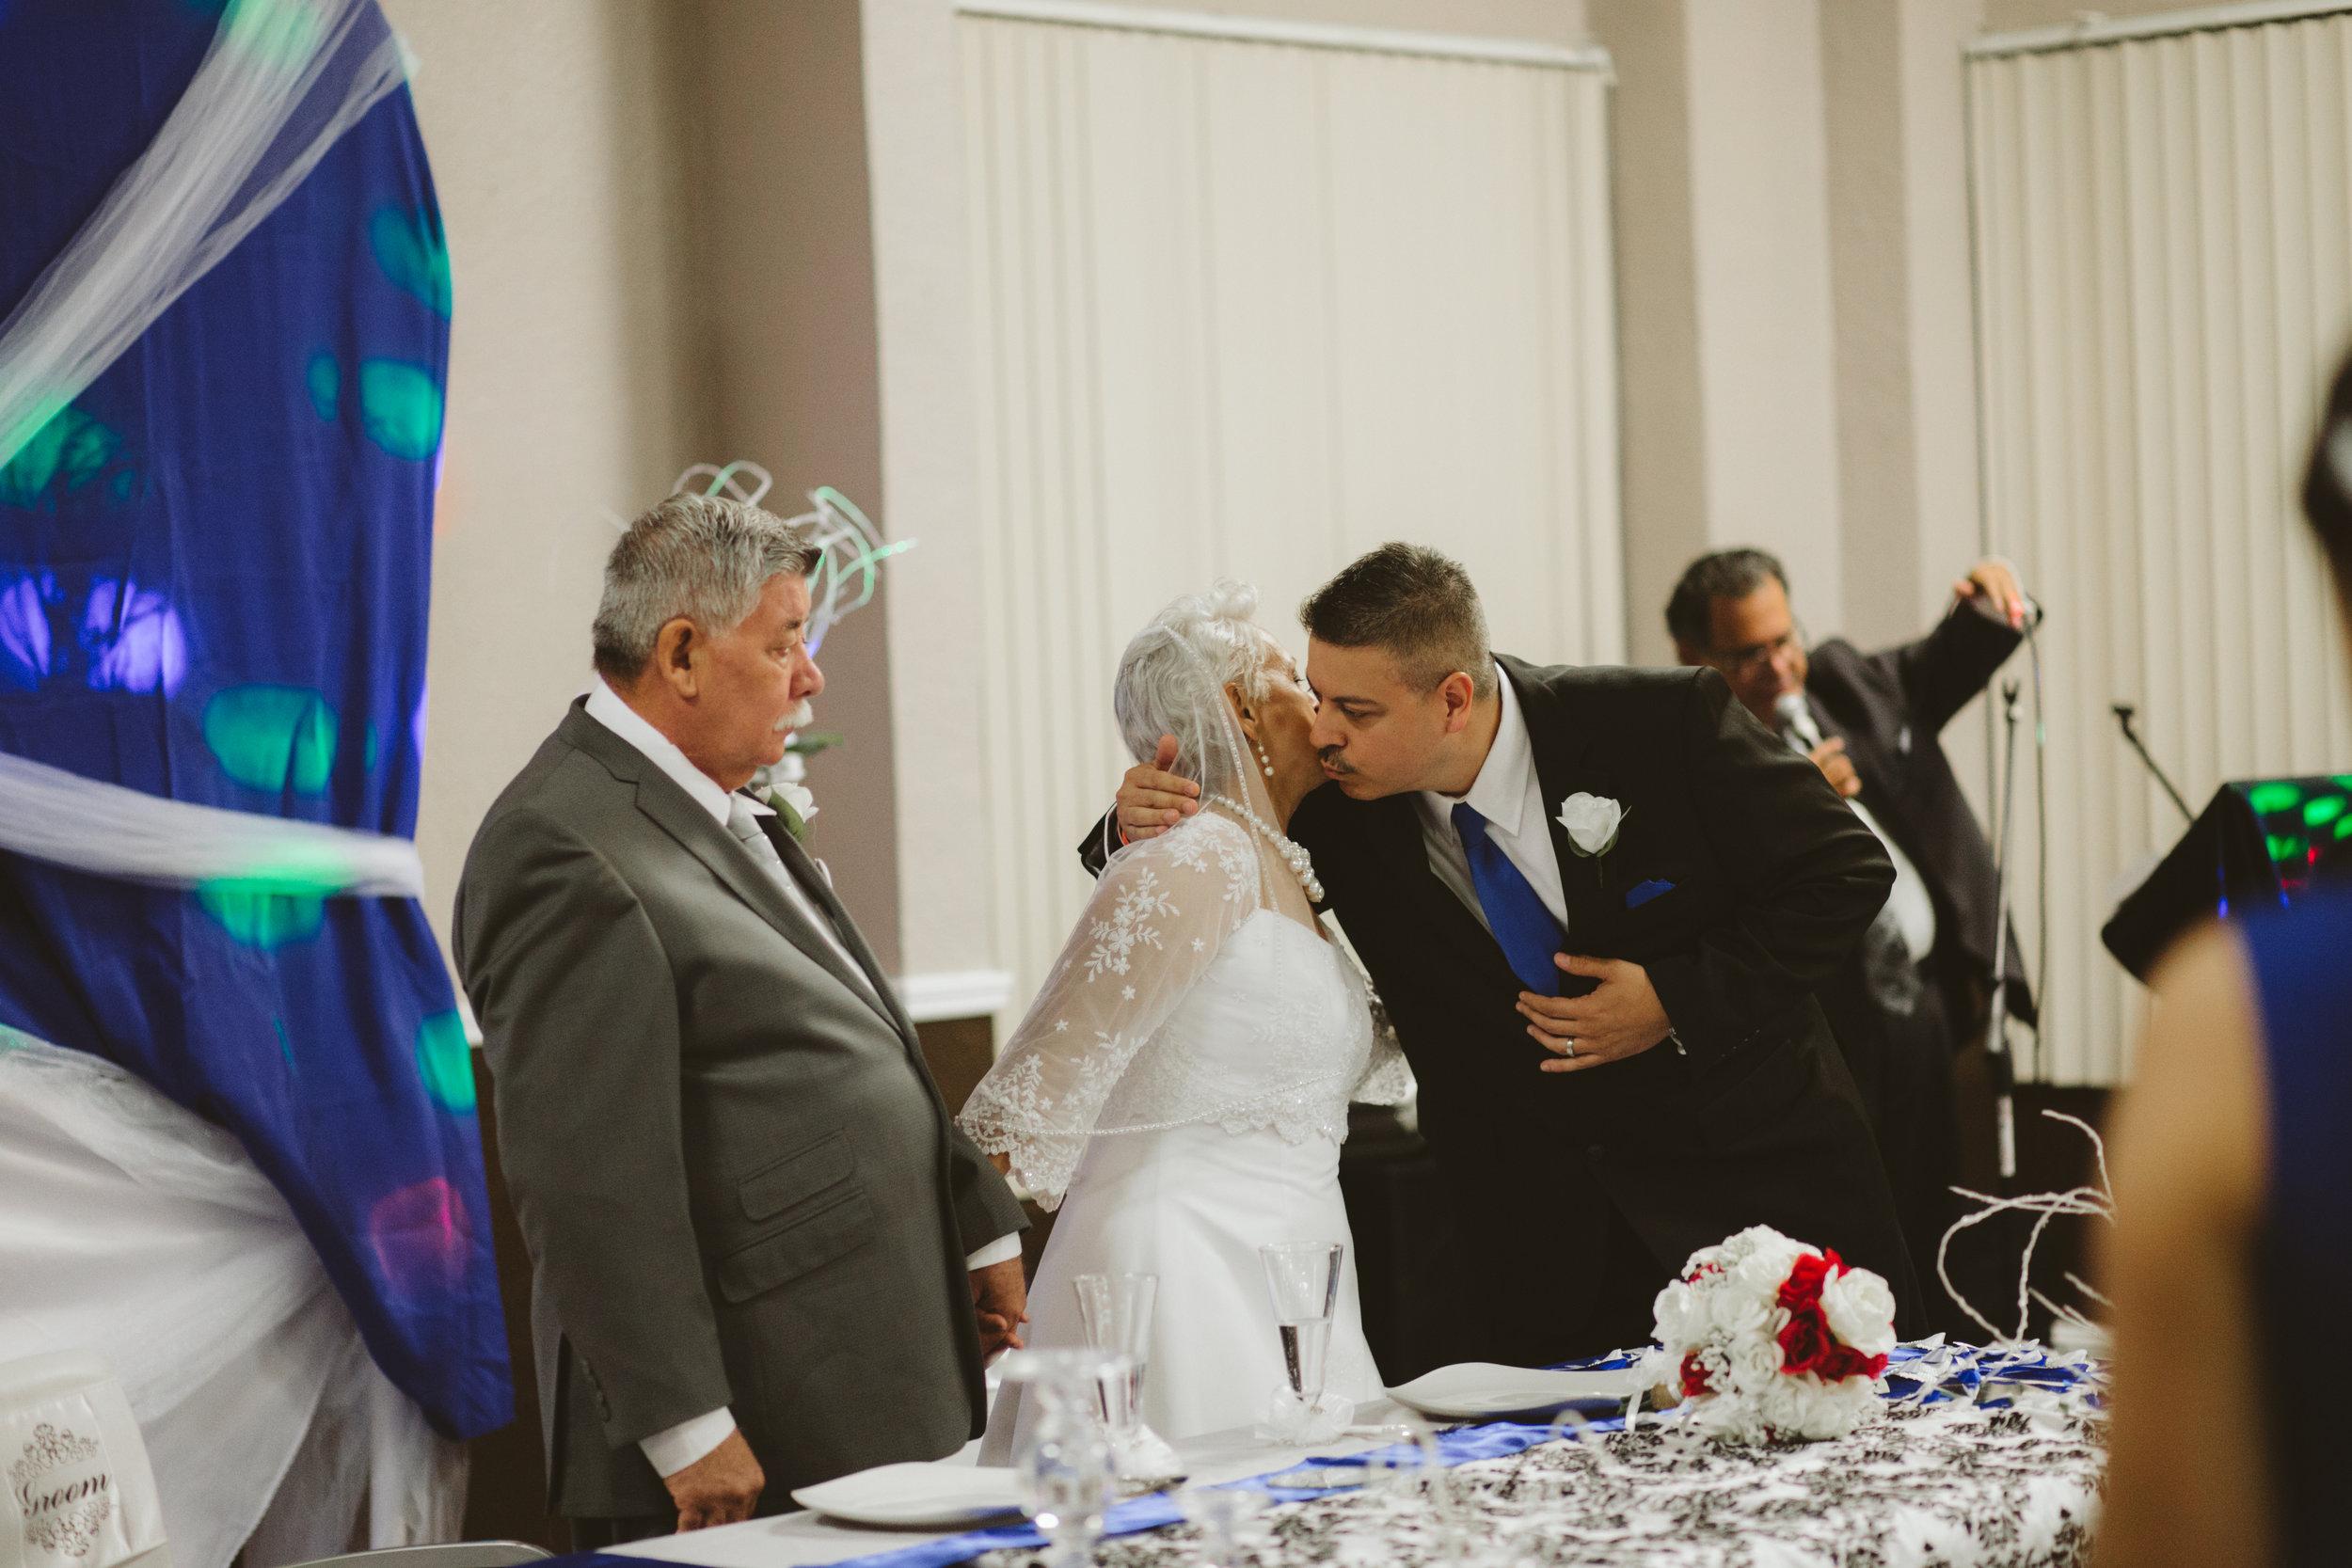 wedding | Vanessa Boy Photography | vanessaboy.com |-274.jpg